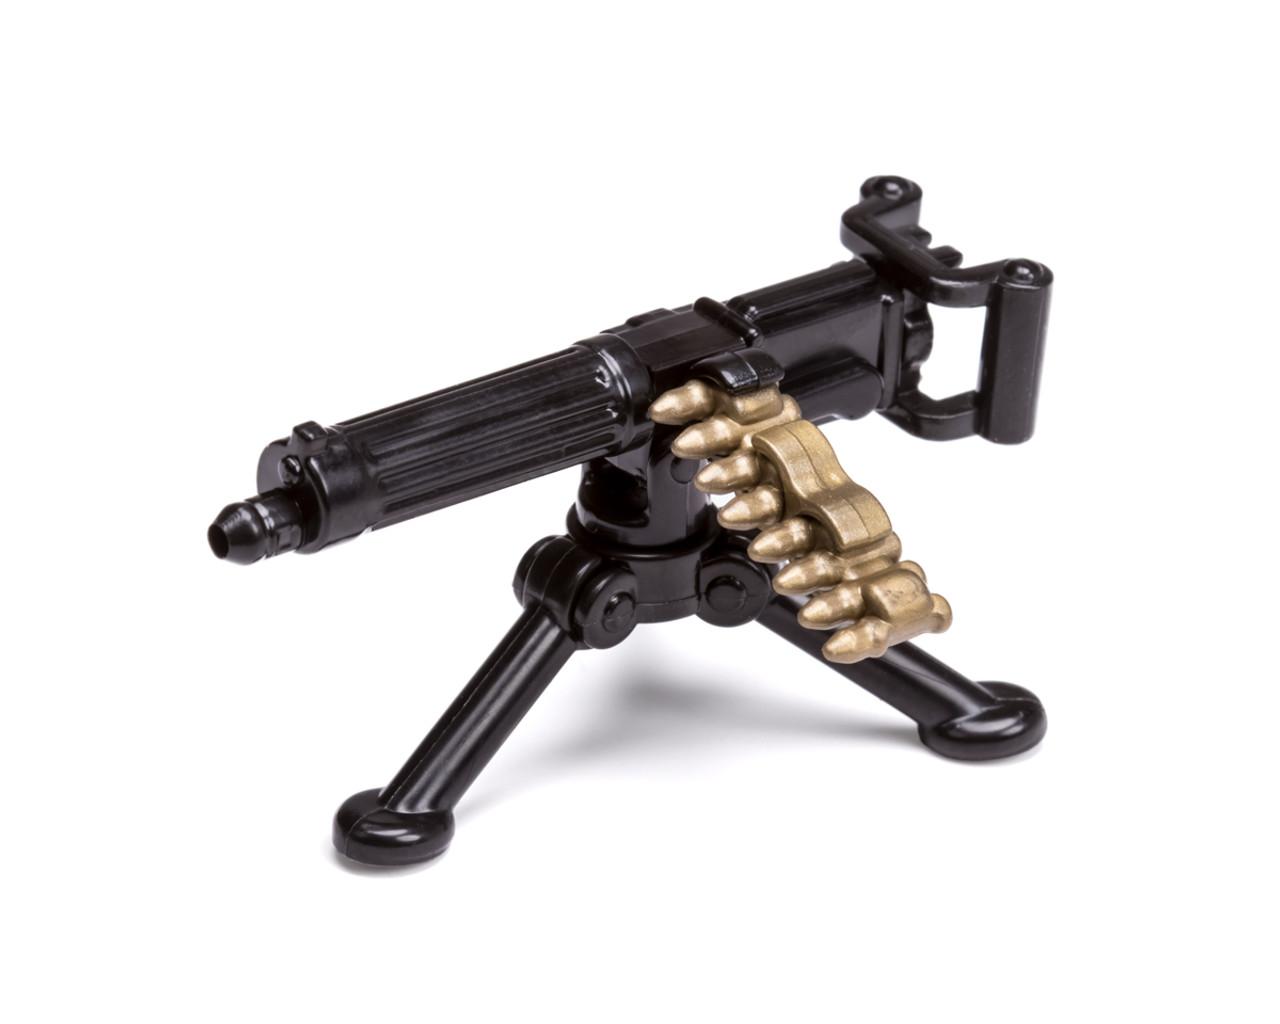 BrickArms Vickers WWI Machine Gun